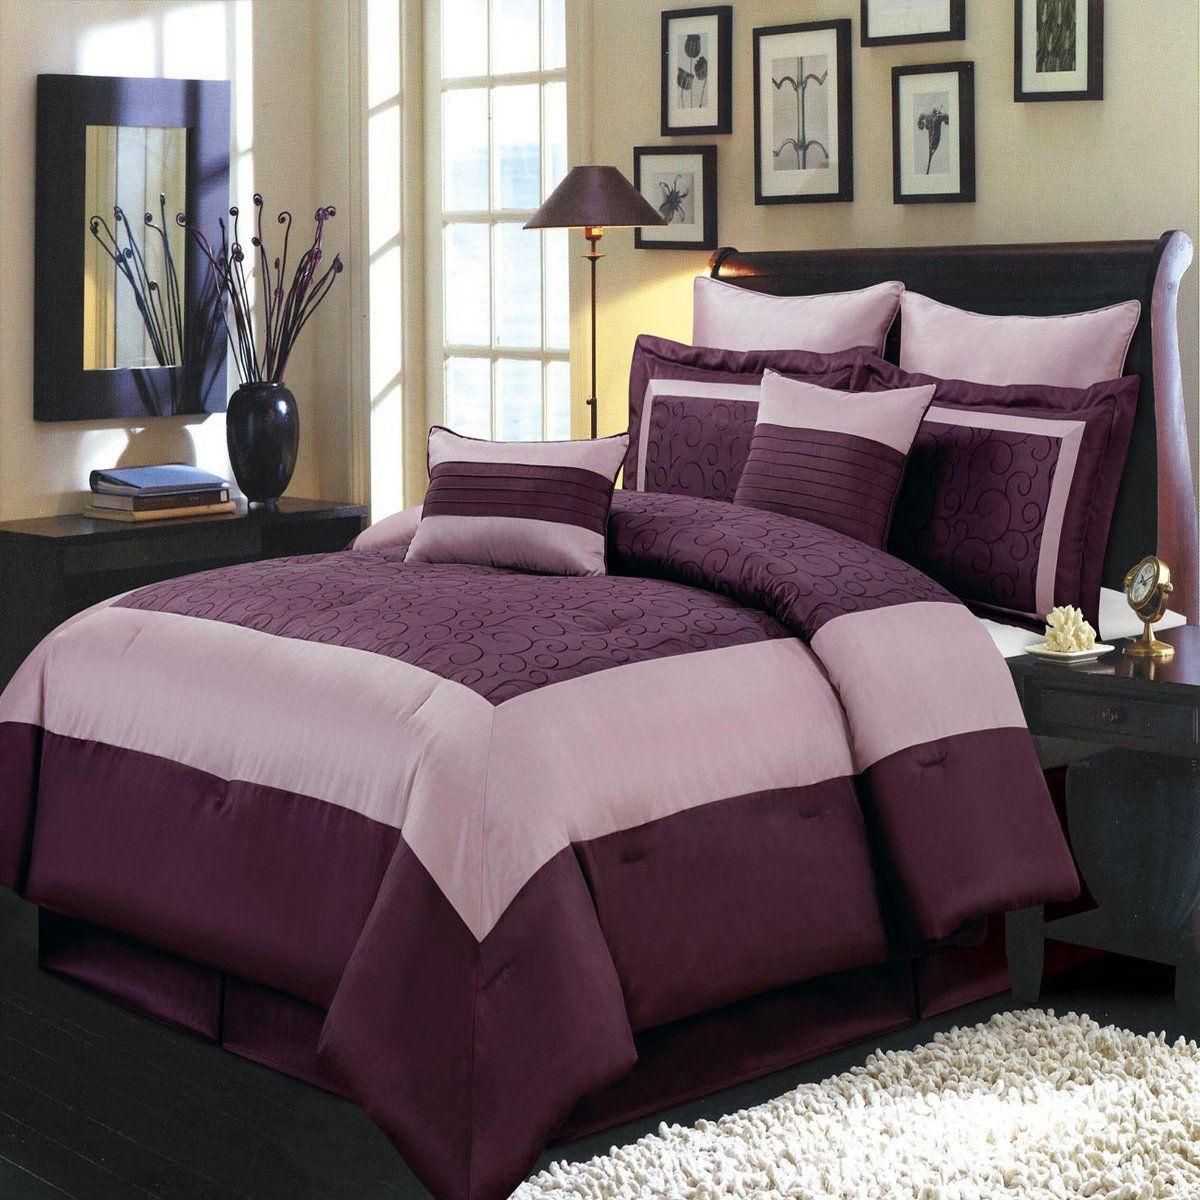 Amazon.com - Wendy Purple Olympic Queen size Luxury 8 piece ...